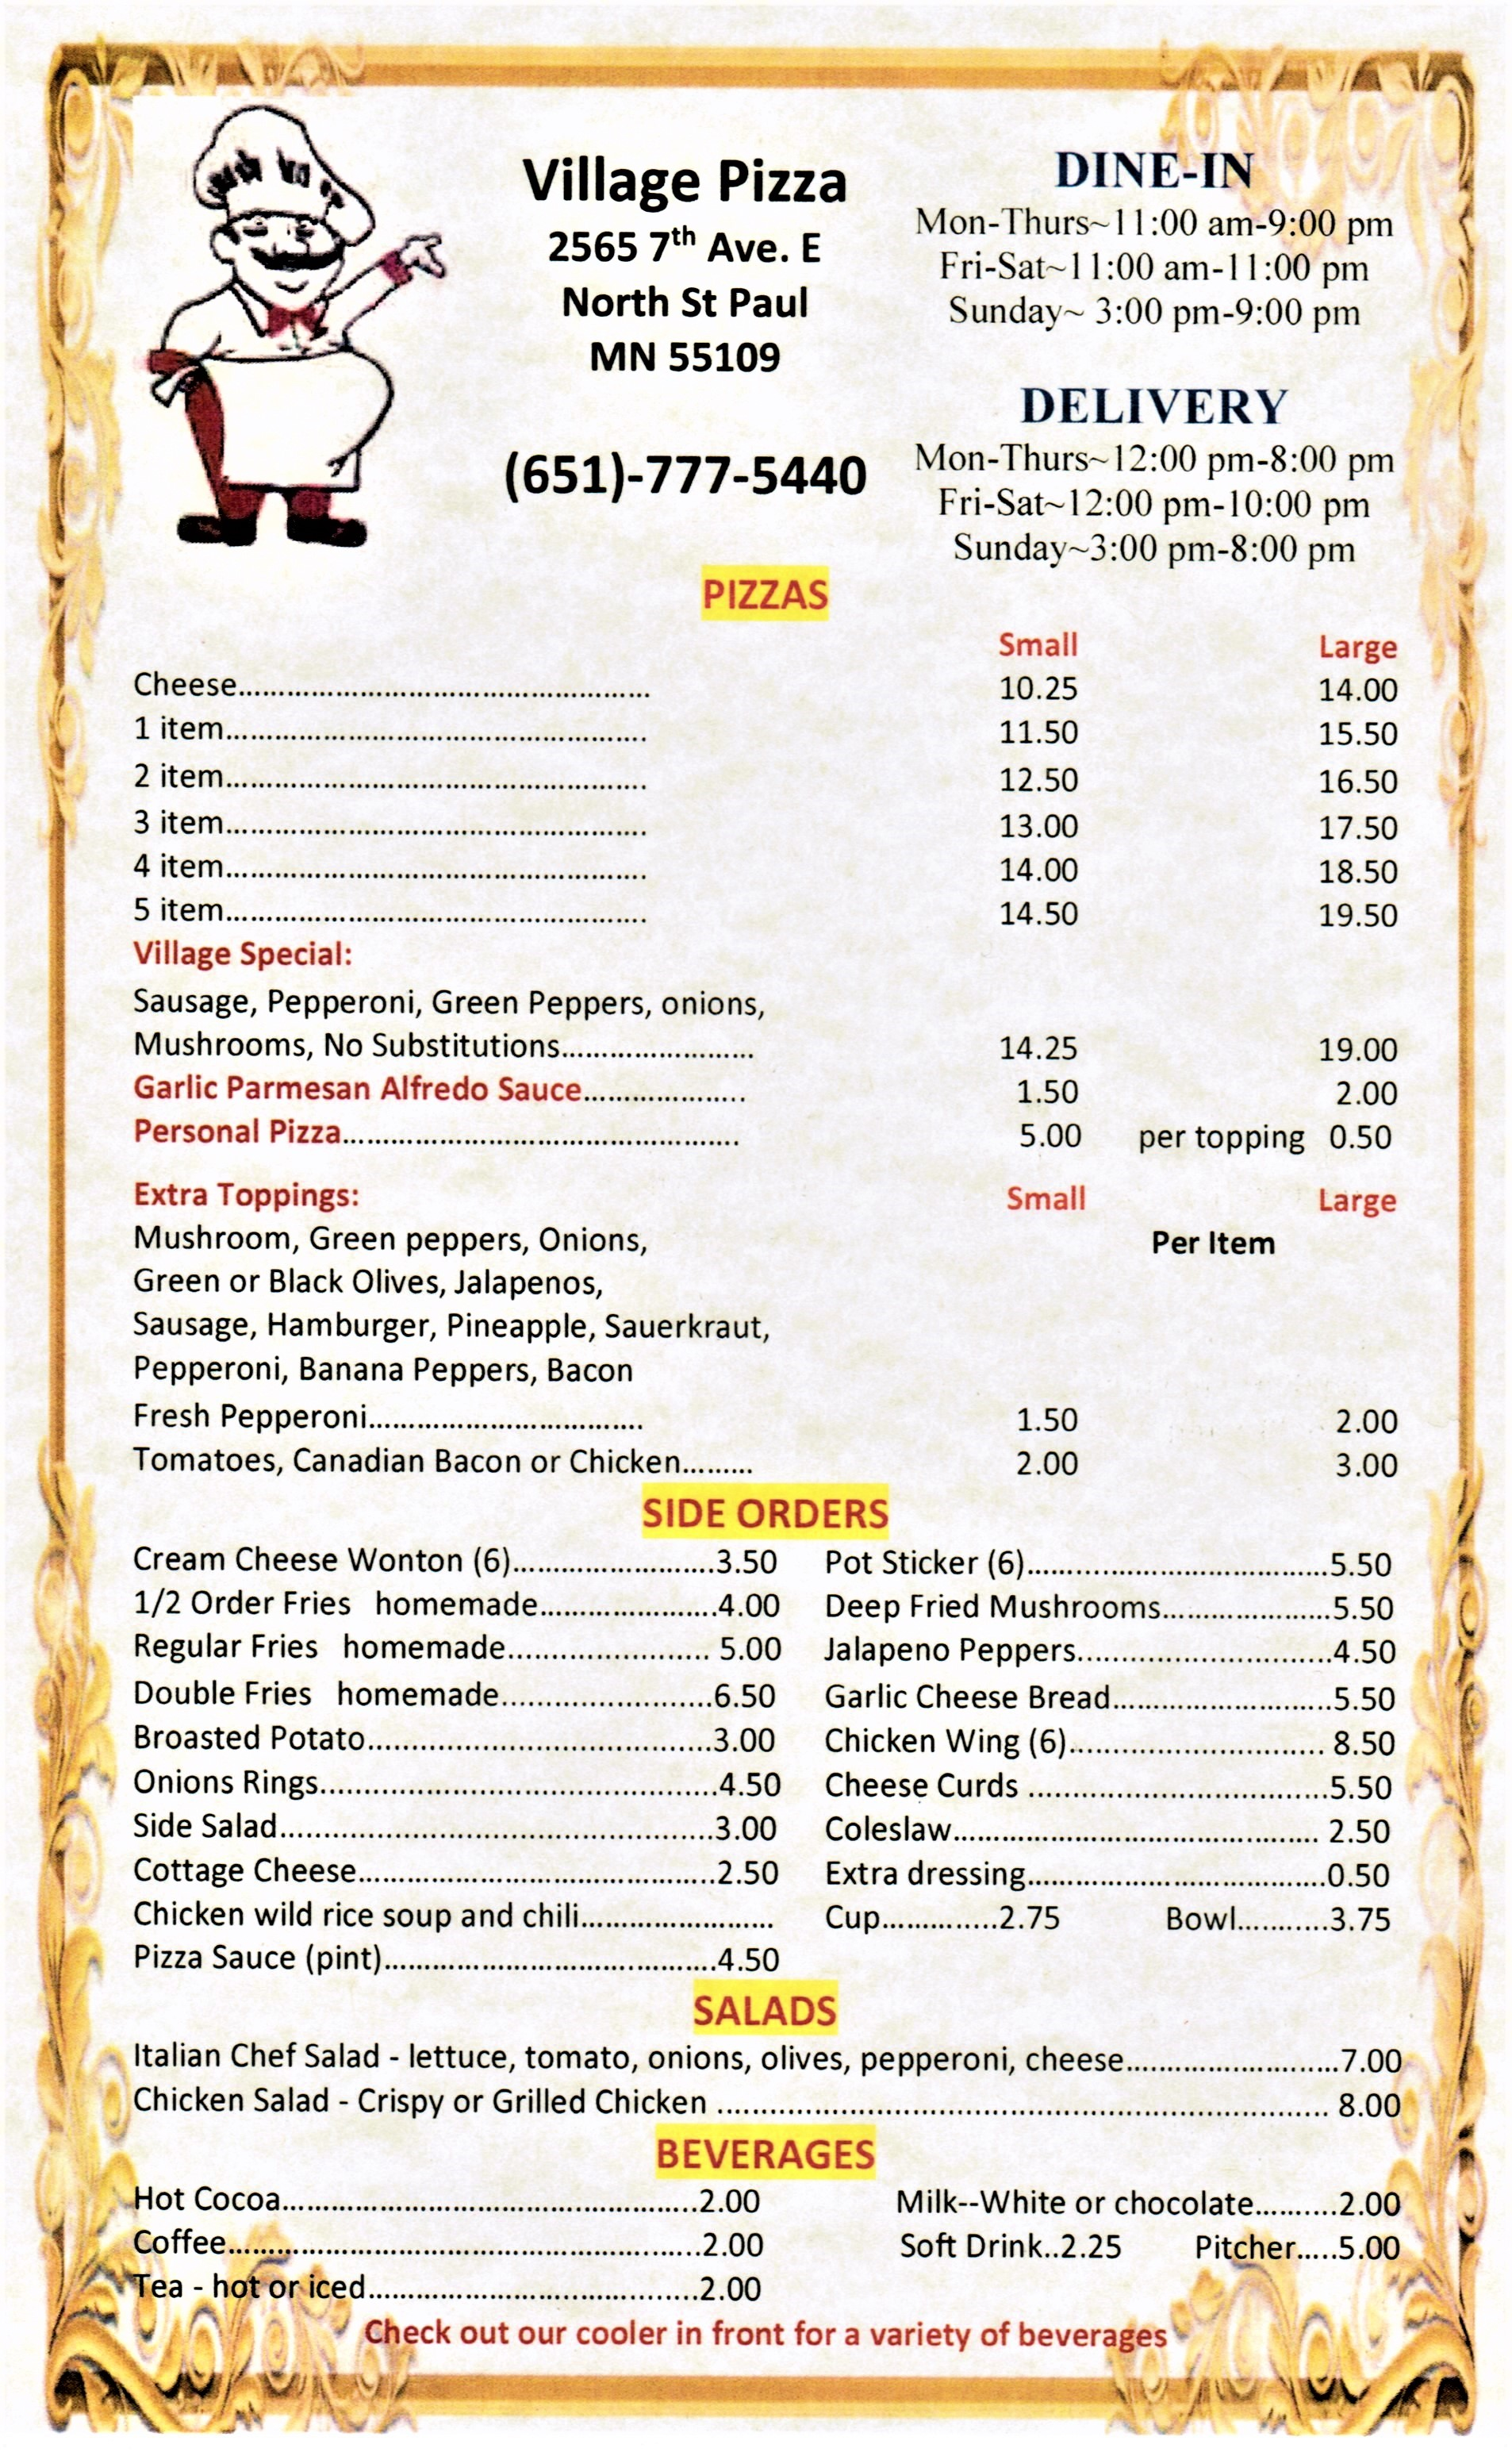 Village Pizza Menu-hard copy 1 (2)